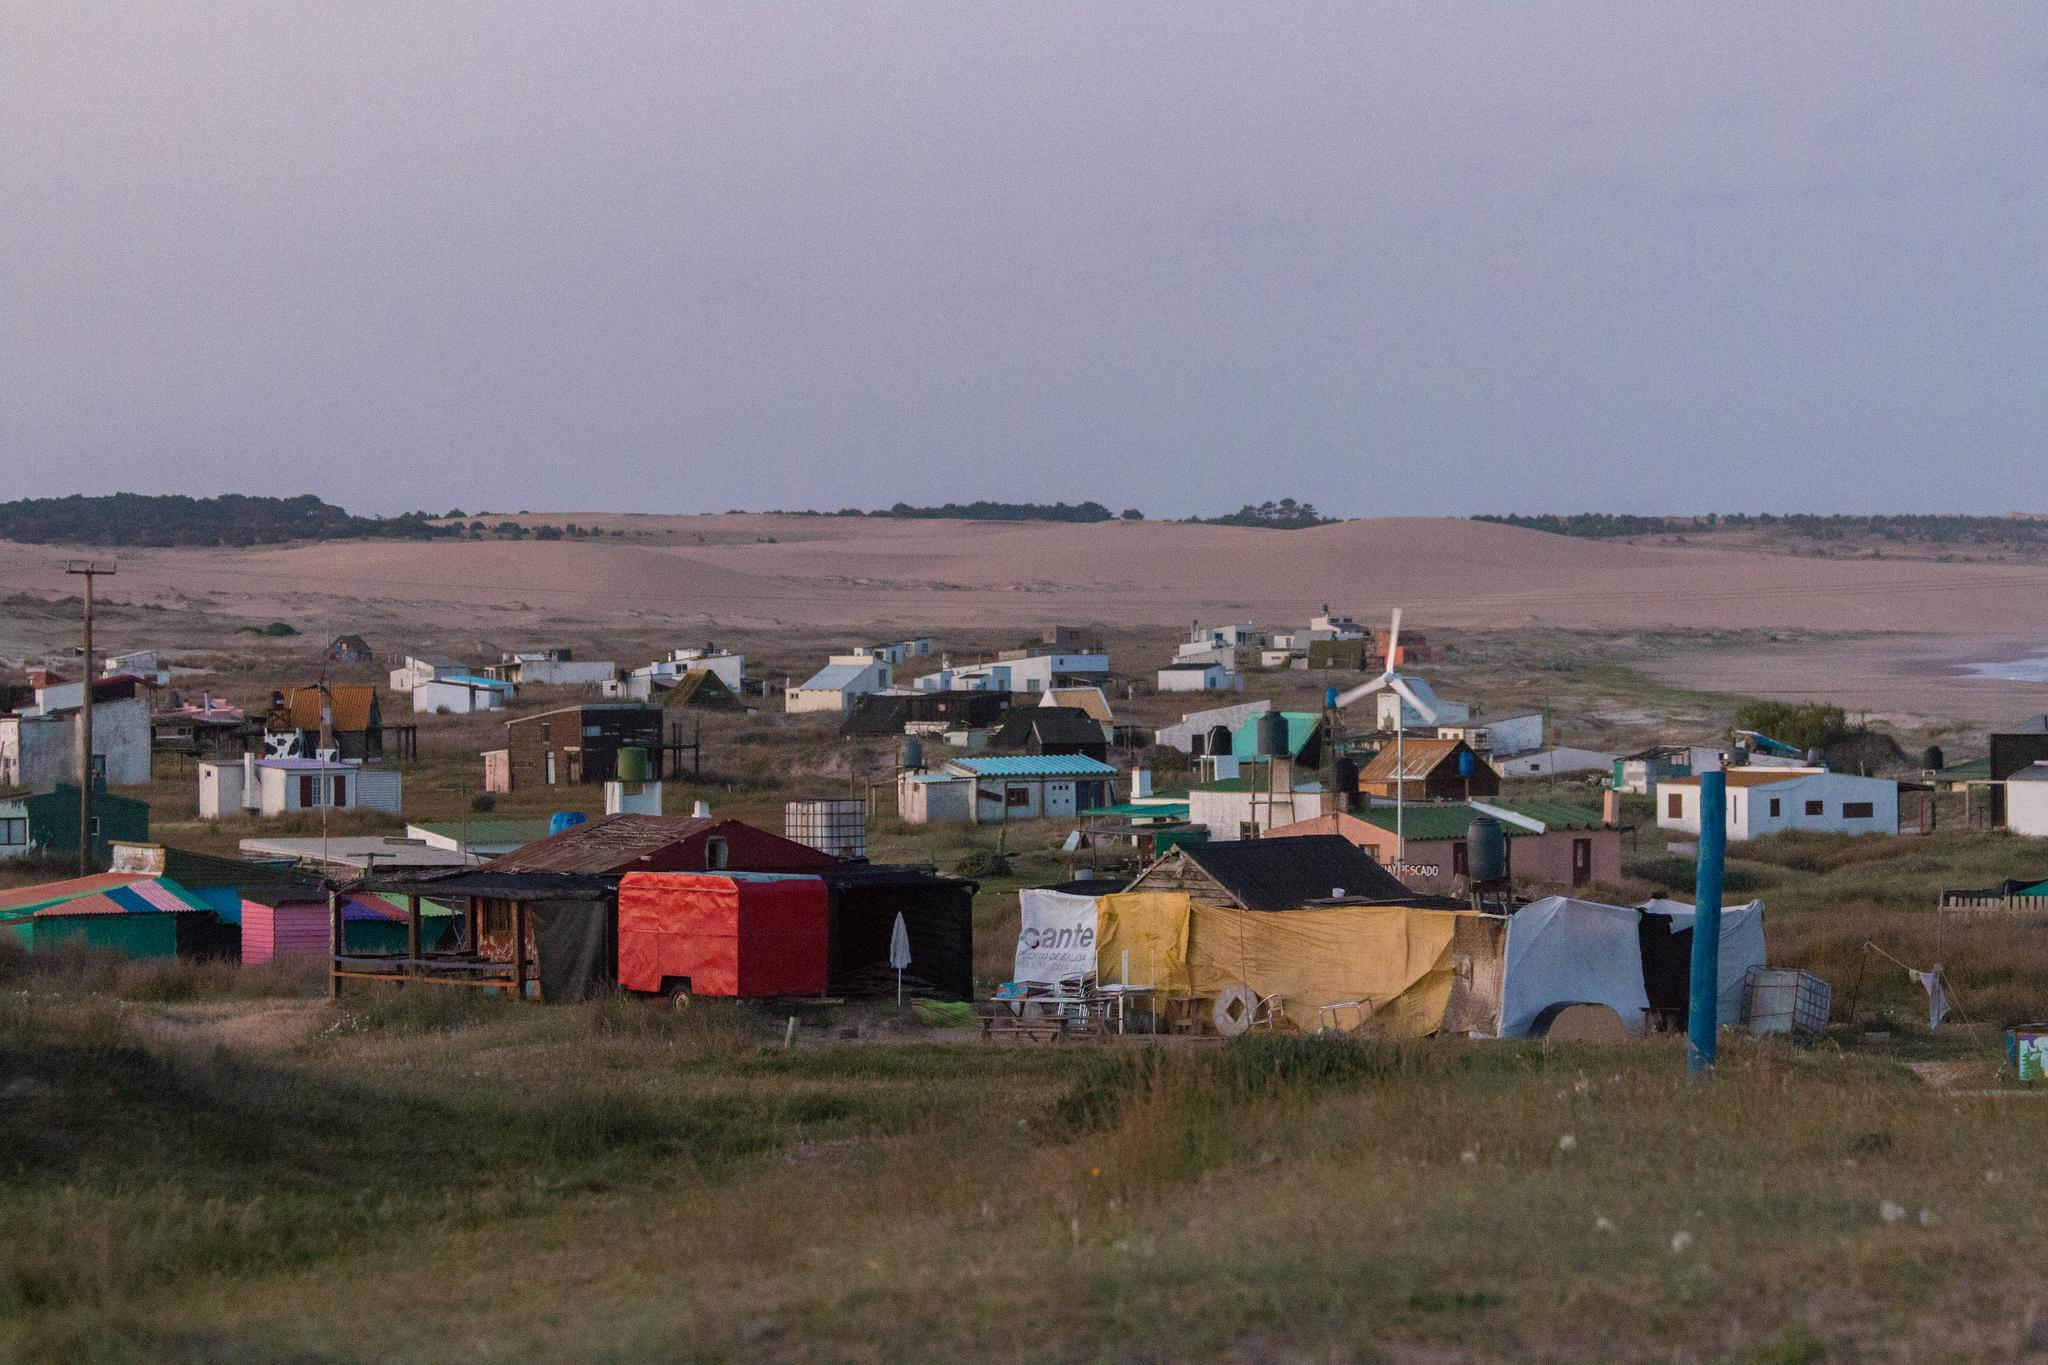 Algunas de las viviendas del Cabo Polonio. Foto: Felipe Reis / Flickr